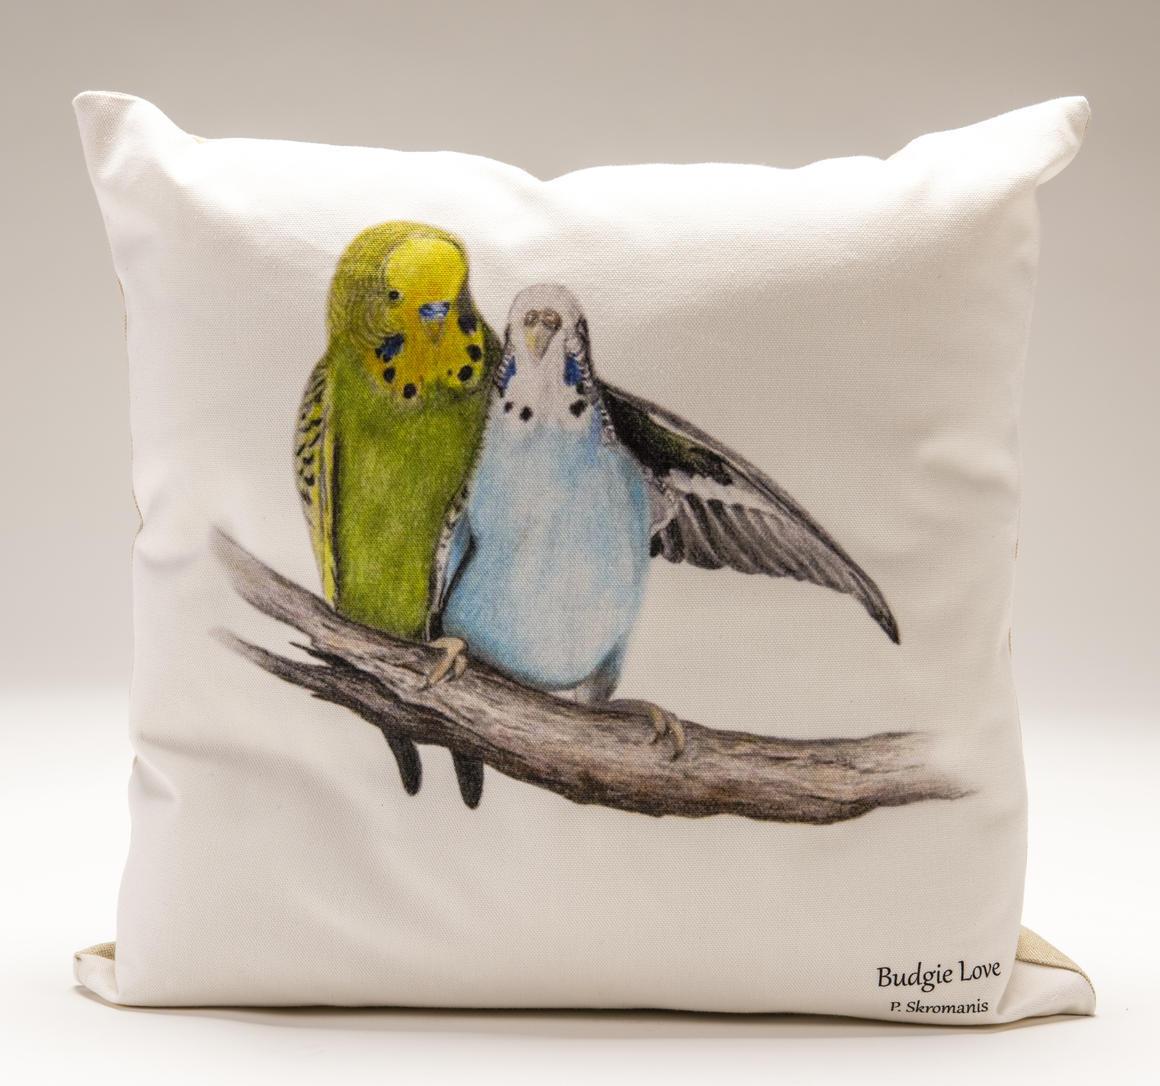 Cushion Covers - Budgie Love   Trada Marketplace